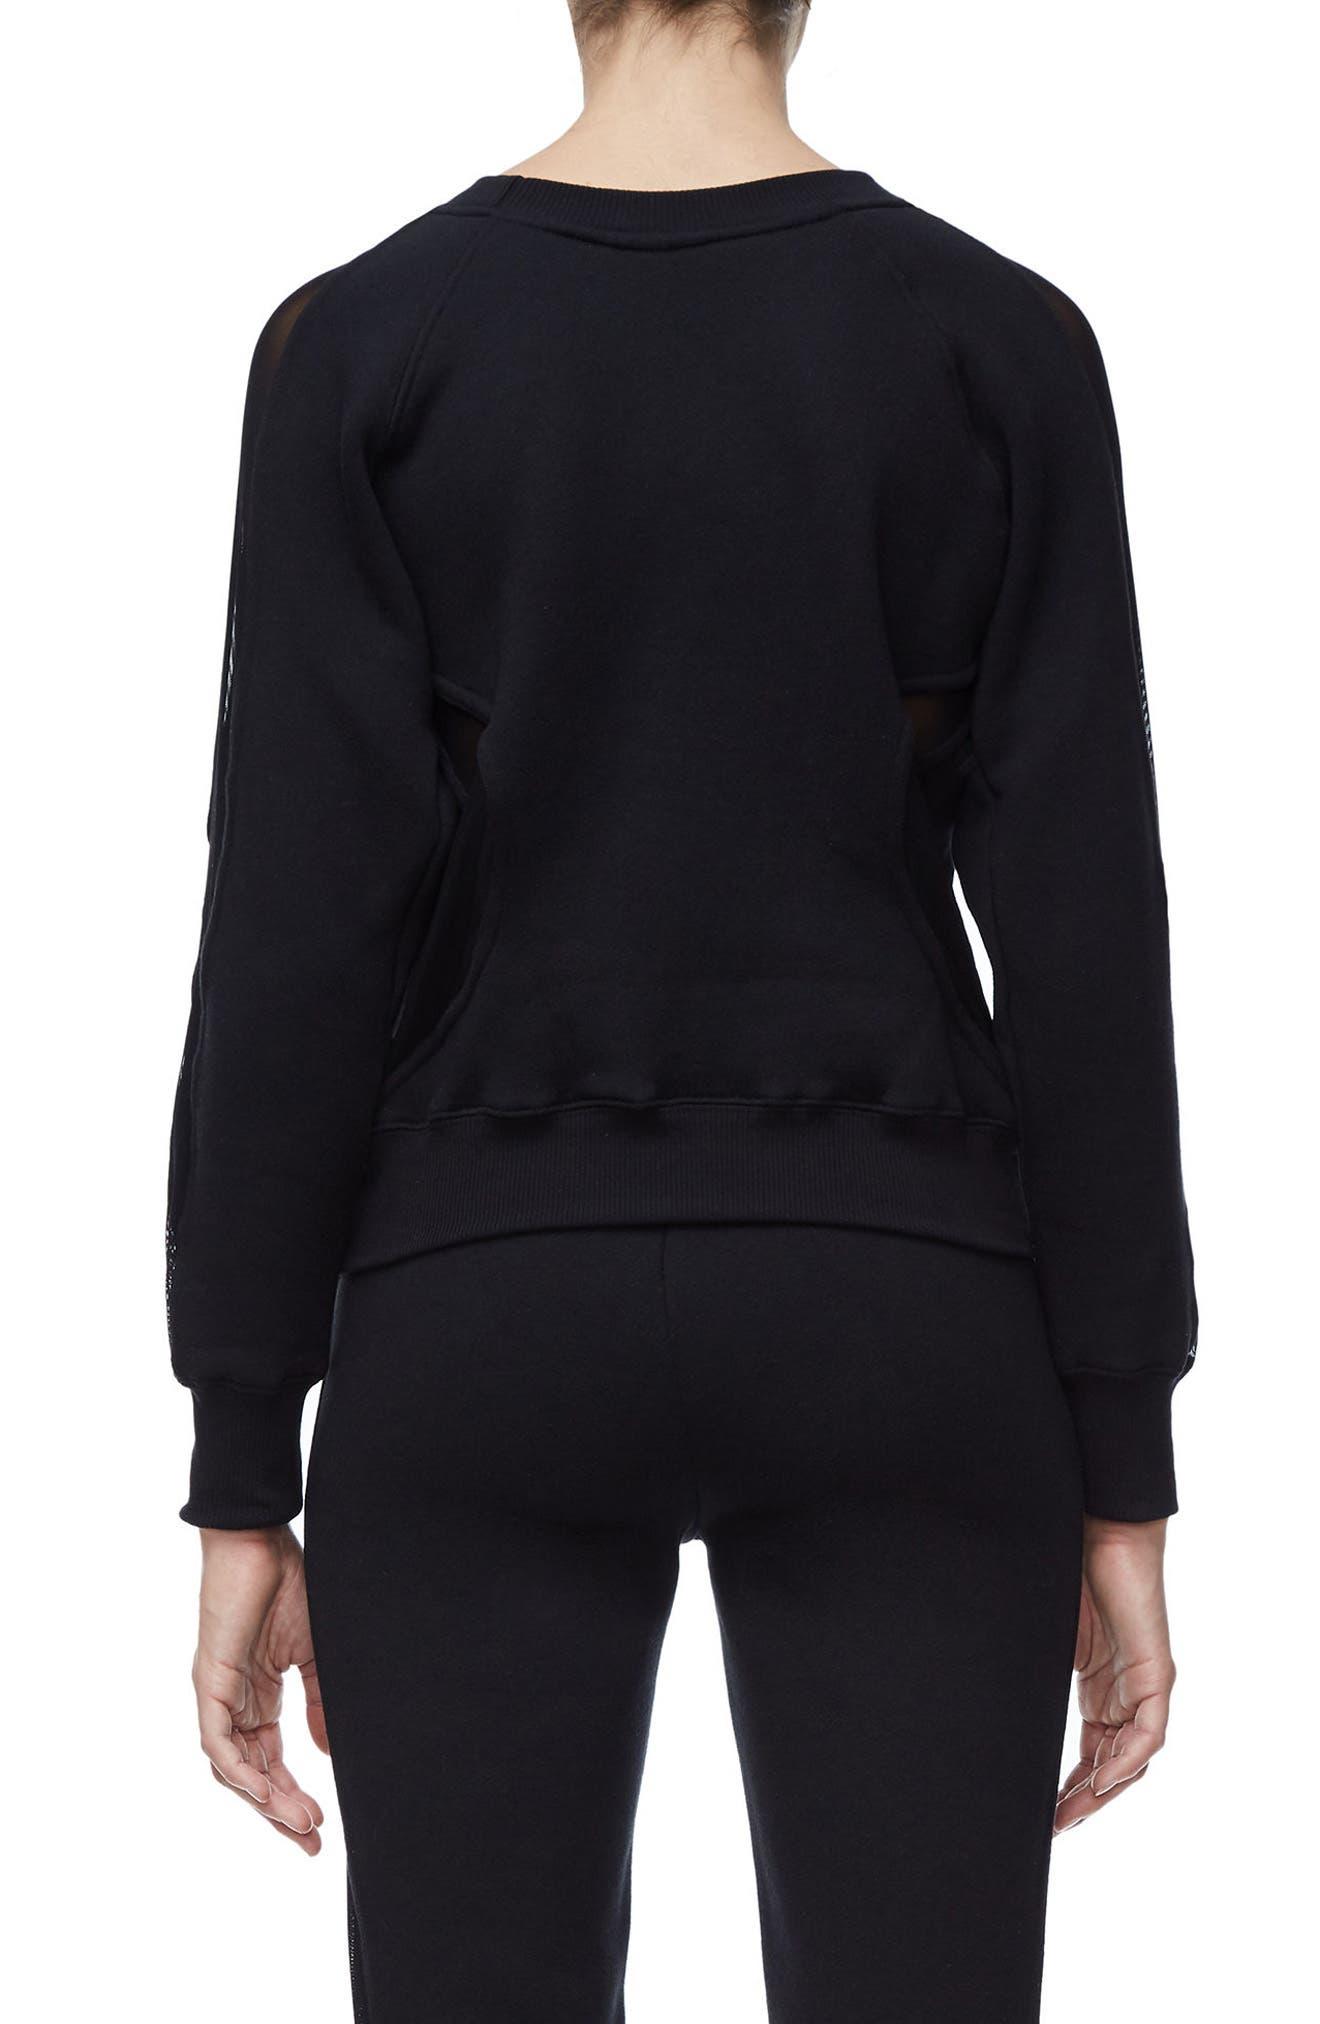 Good Sweats Mesh Inset Sweatshirt,                             Alternate thumbnail 3, color,                             Good Black